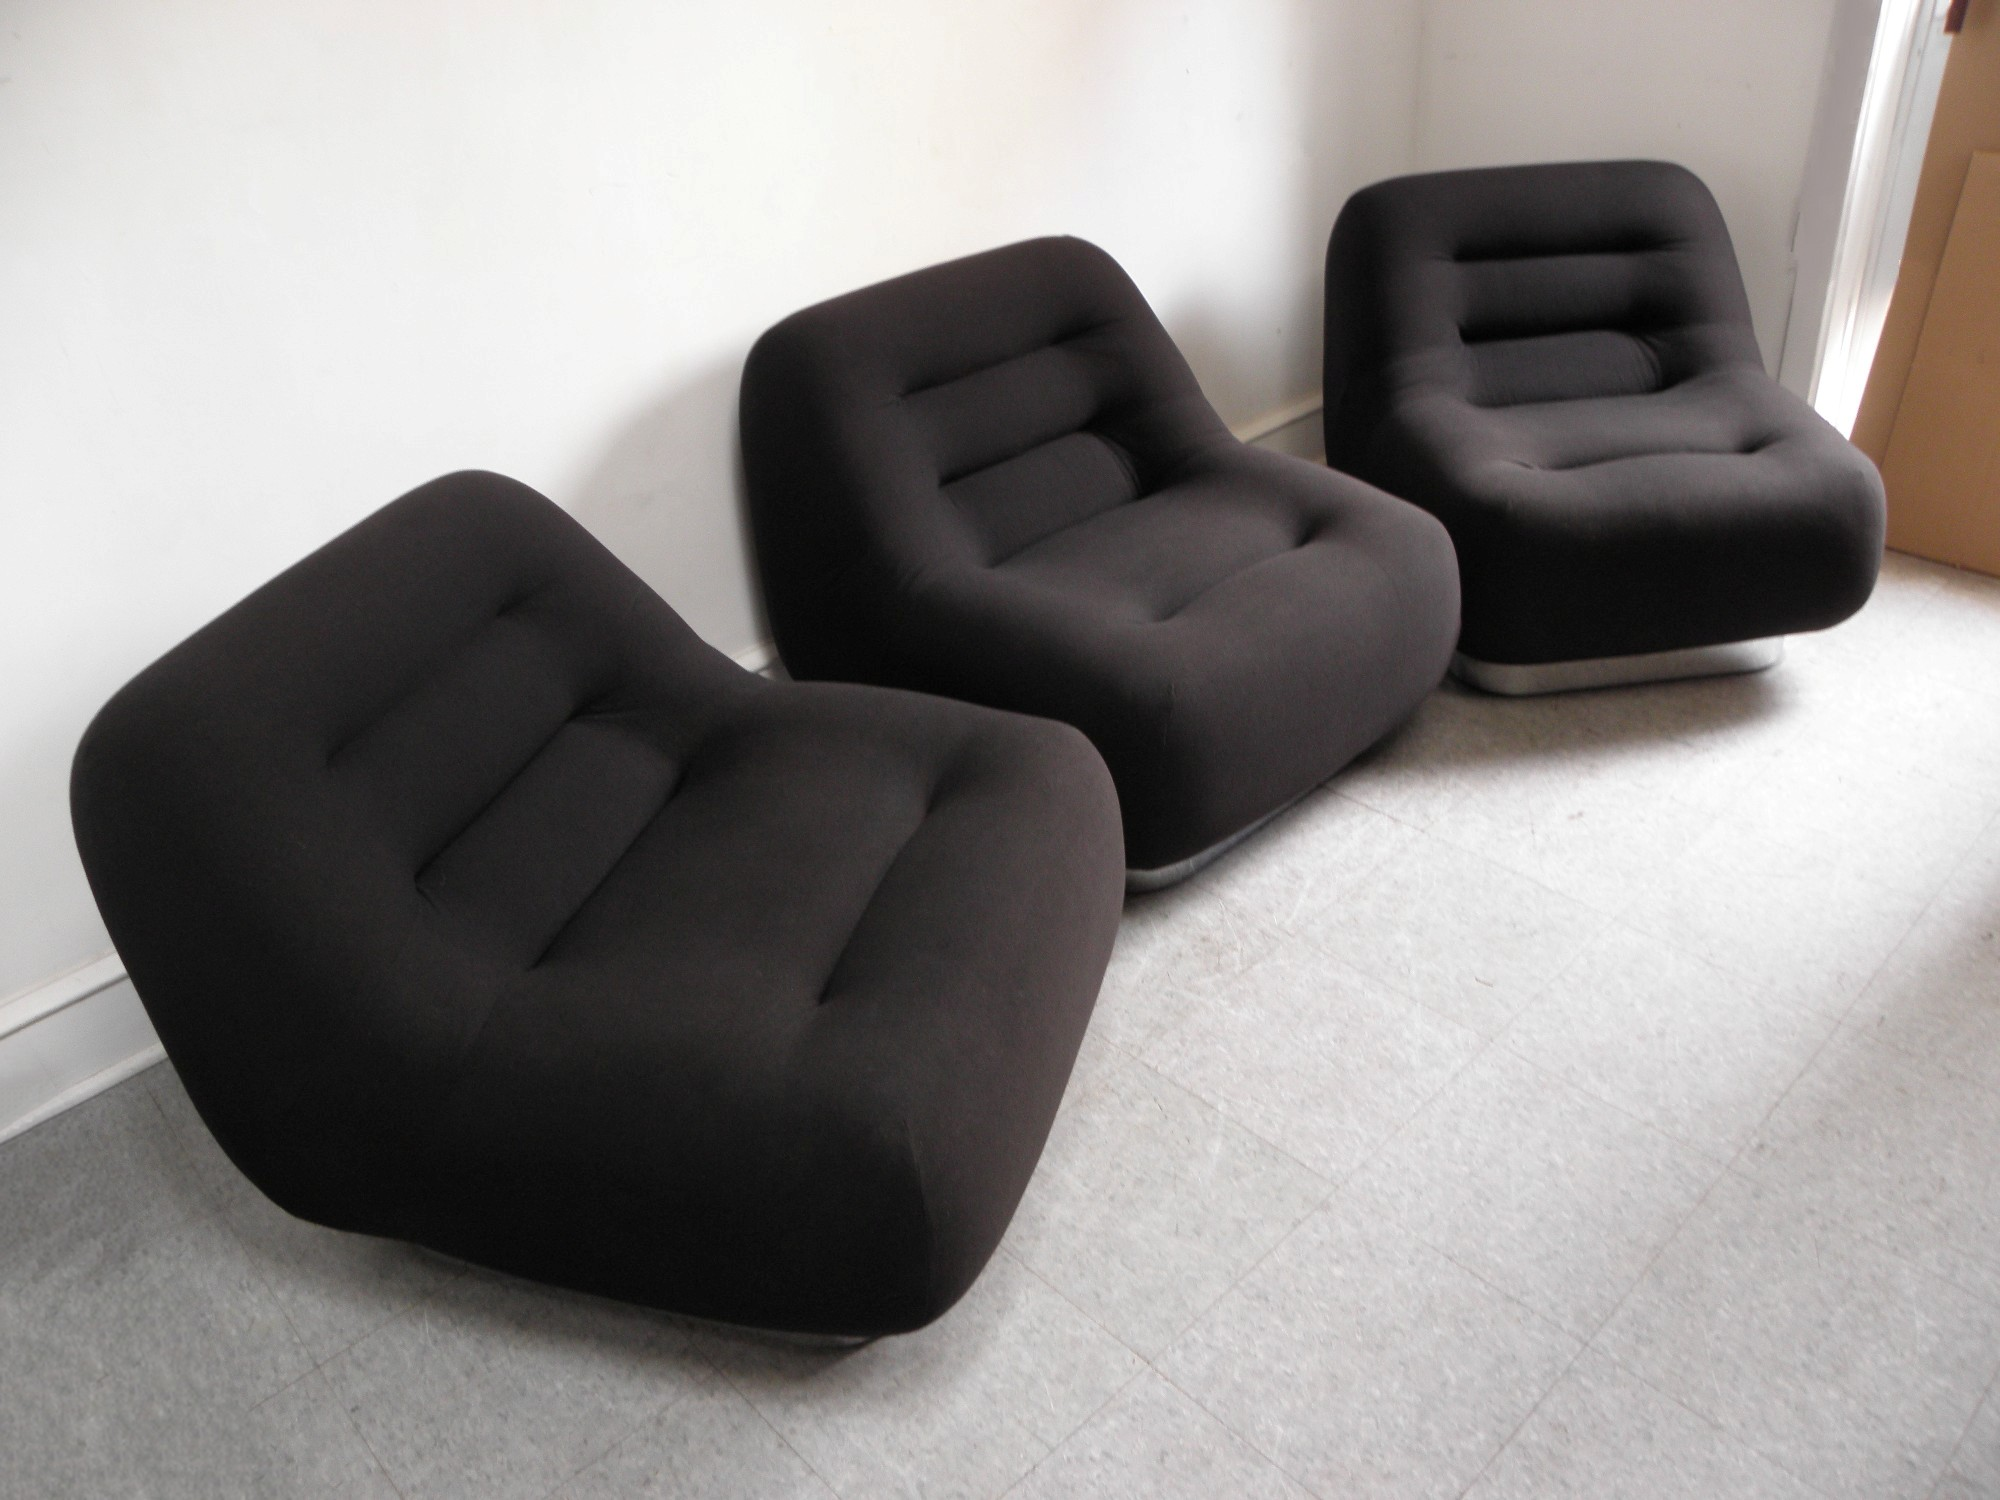 M F Harty mid century modern Tomorrow modular chair sofa 3